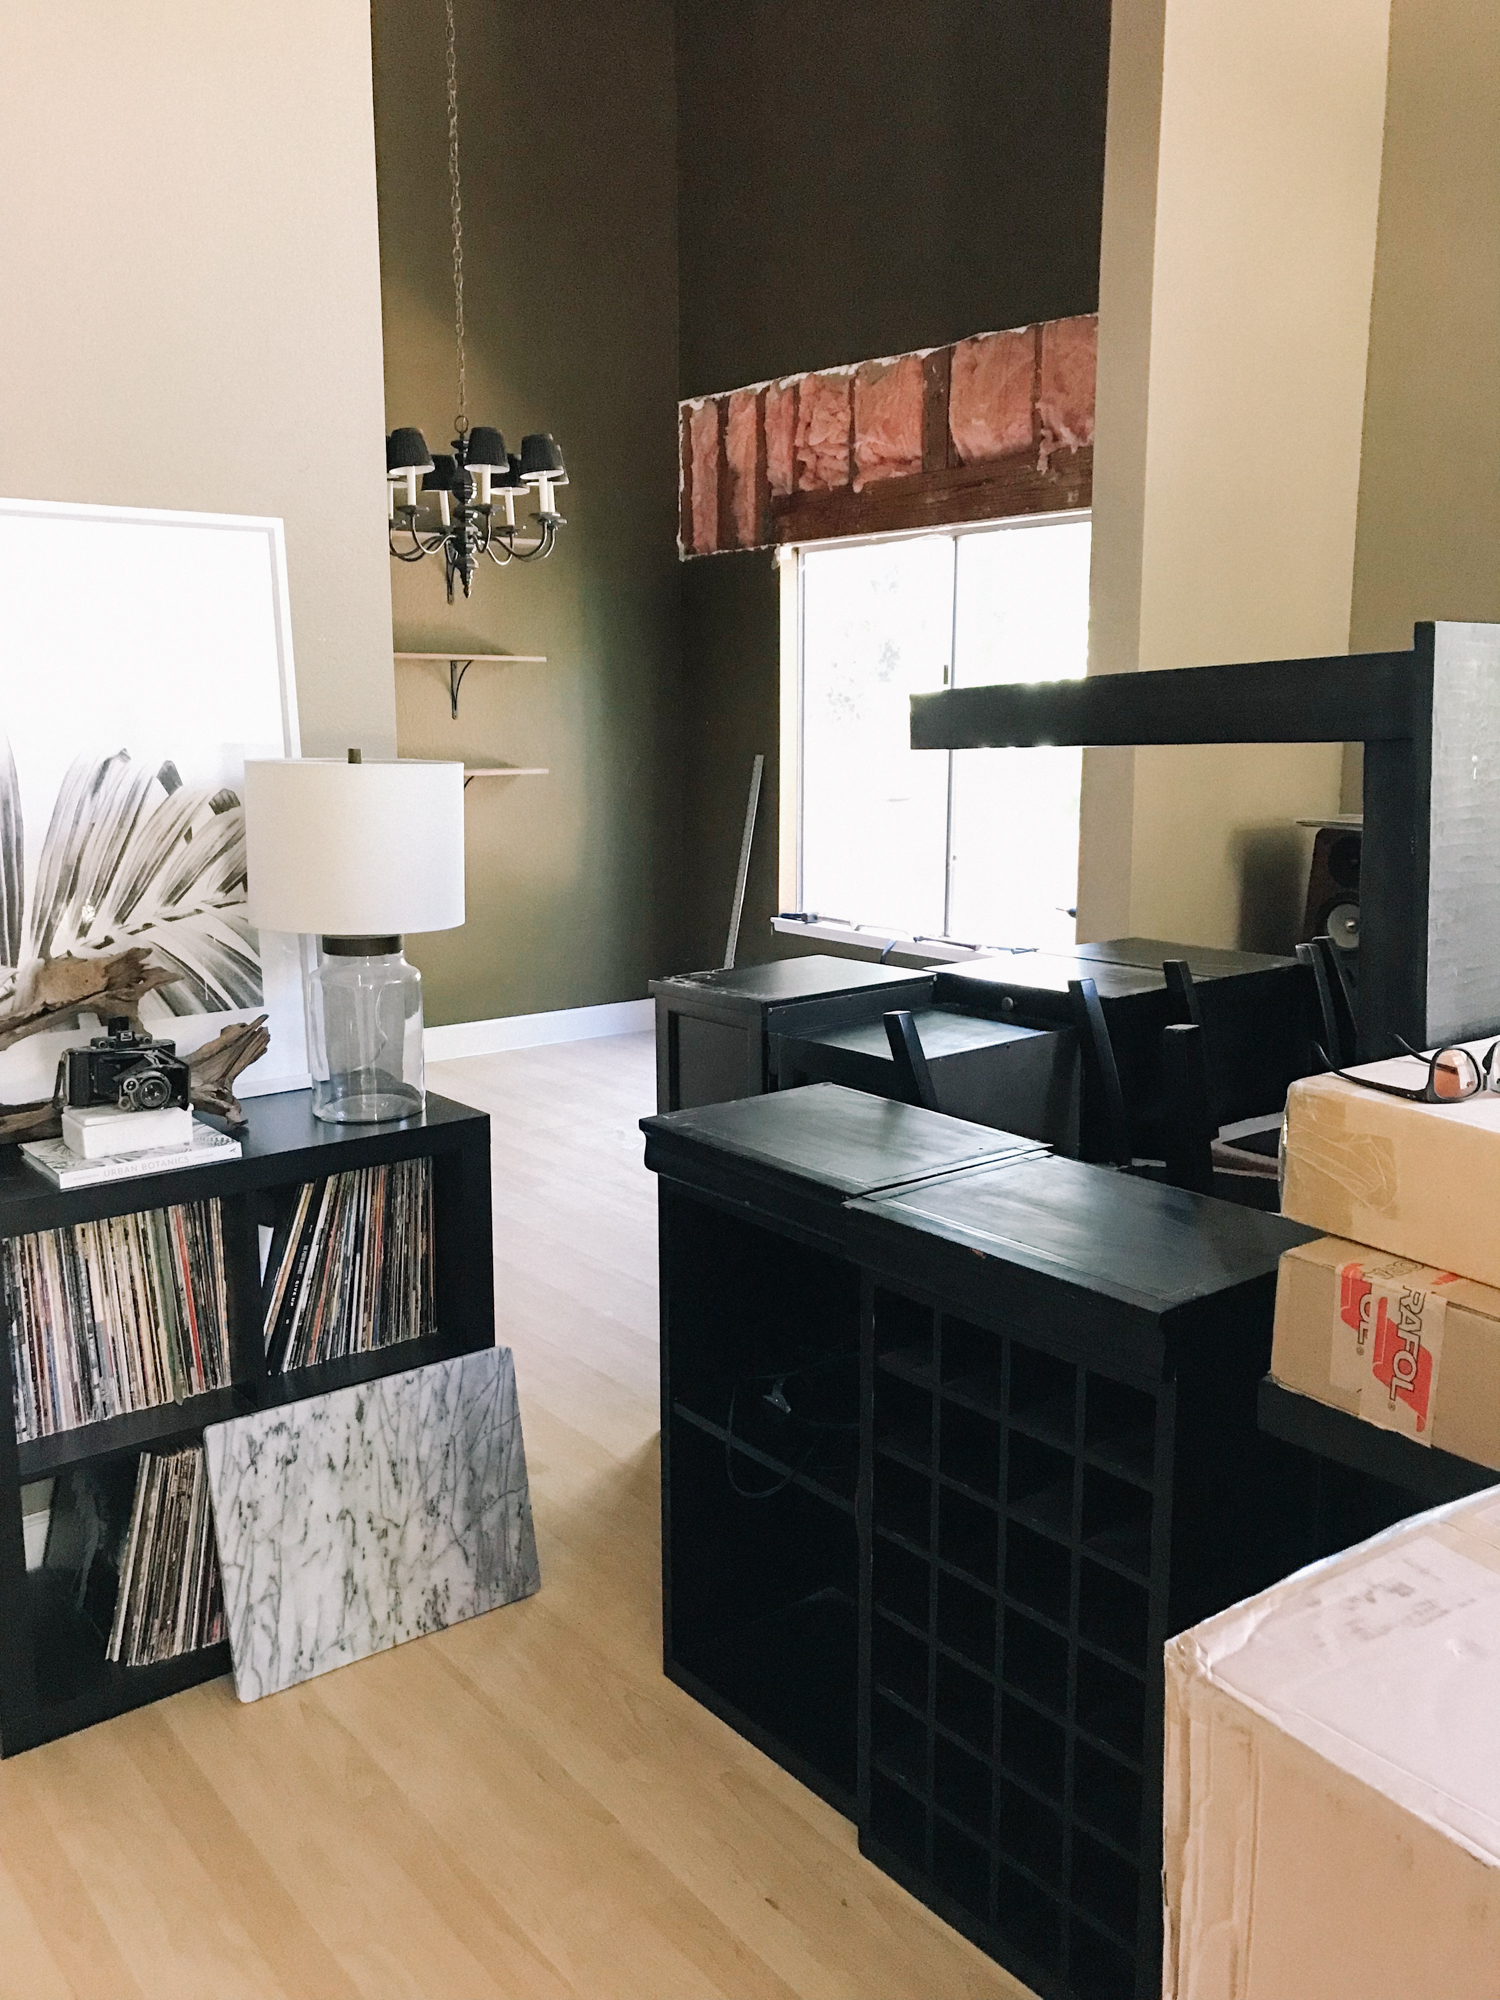 Home renovation update | A Fabulous Fete